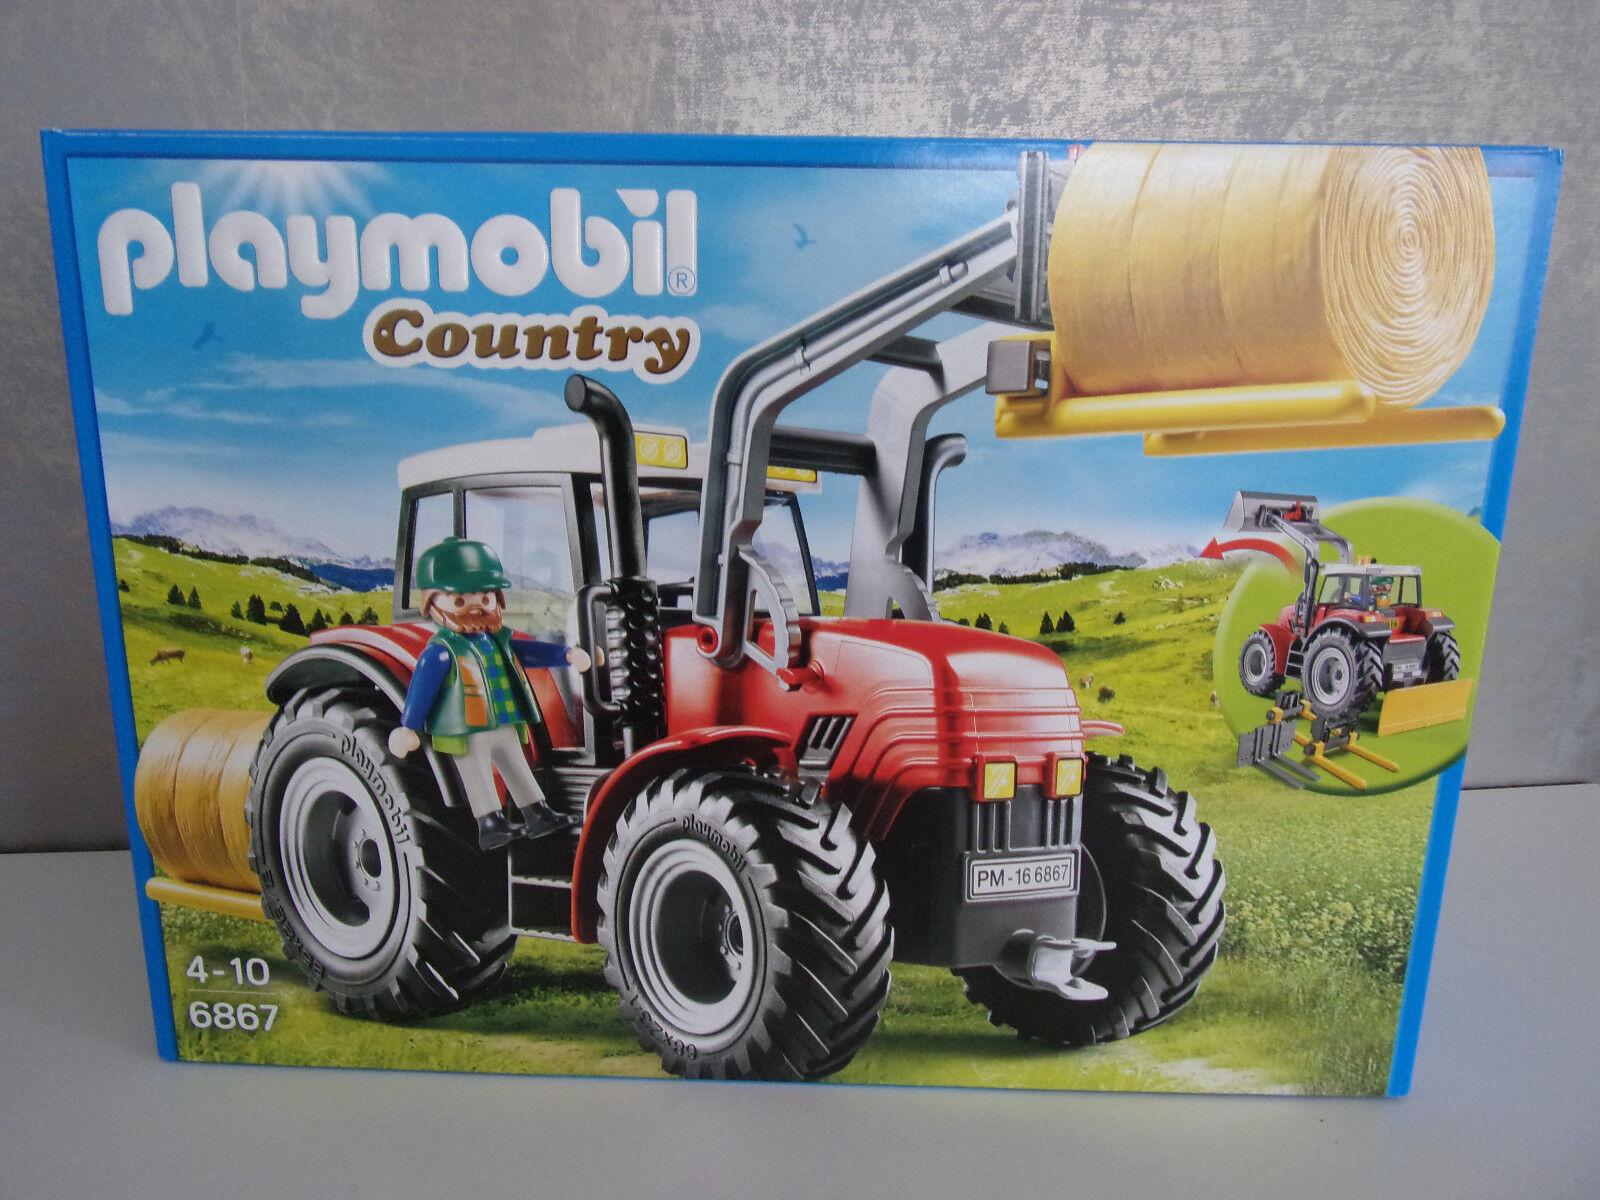 Playmobil Country 6867 Riesentraktor avec Spezialwerkzeugen -